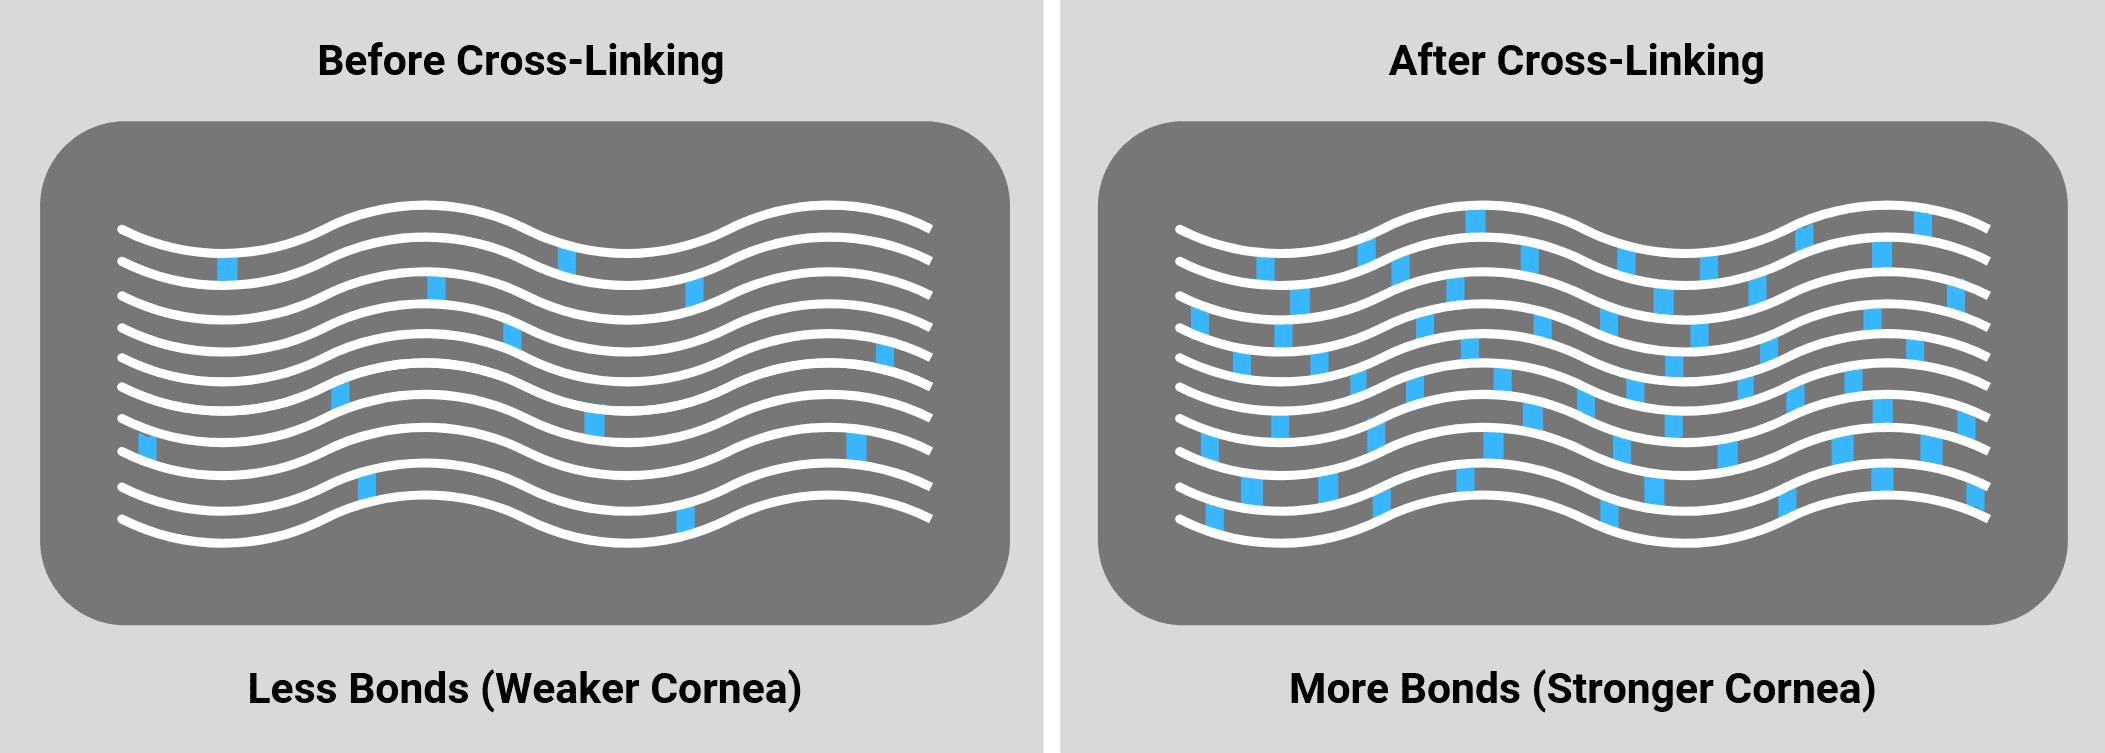 Cornea Image